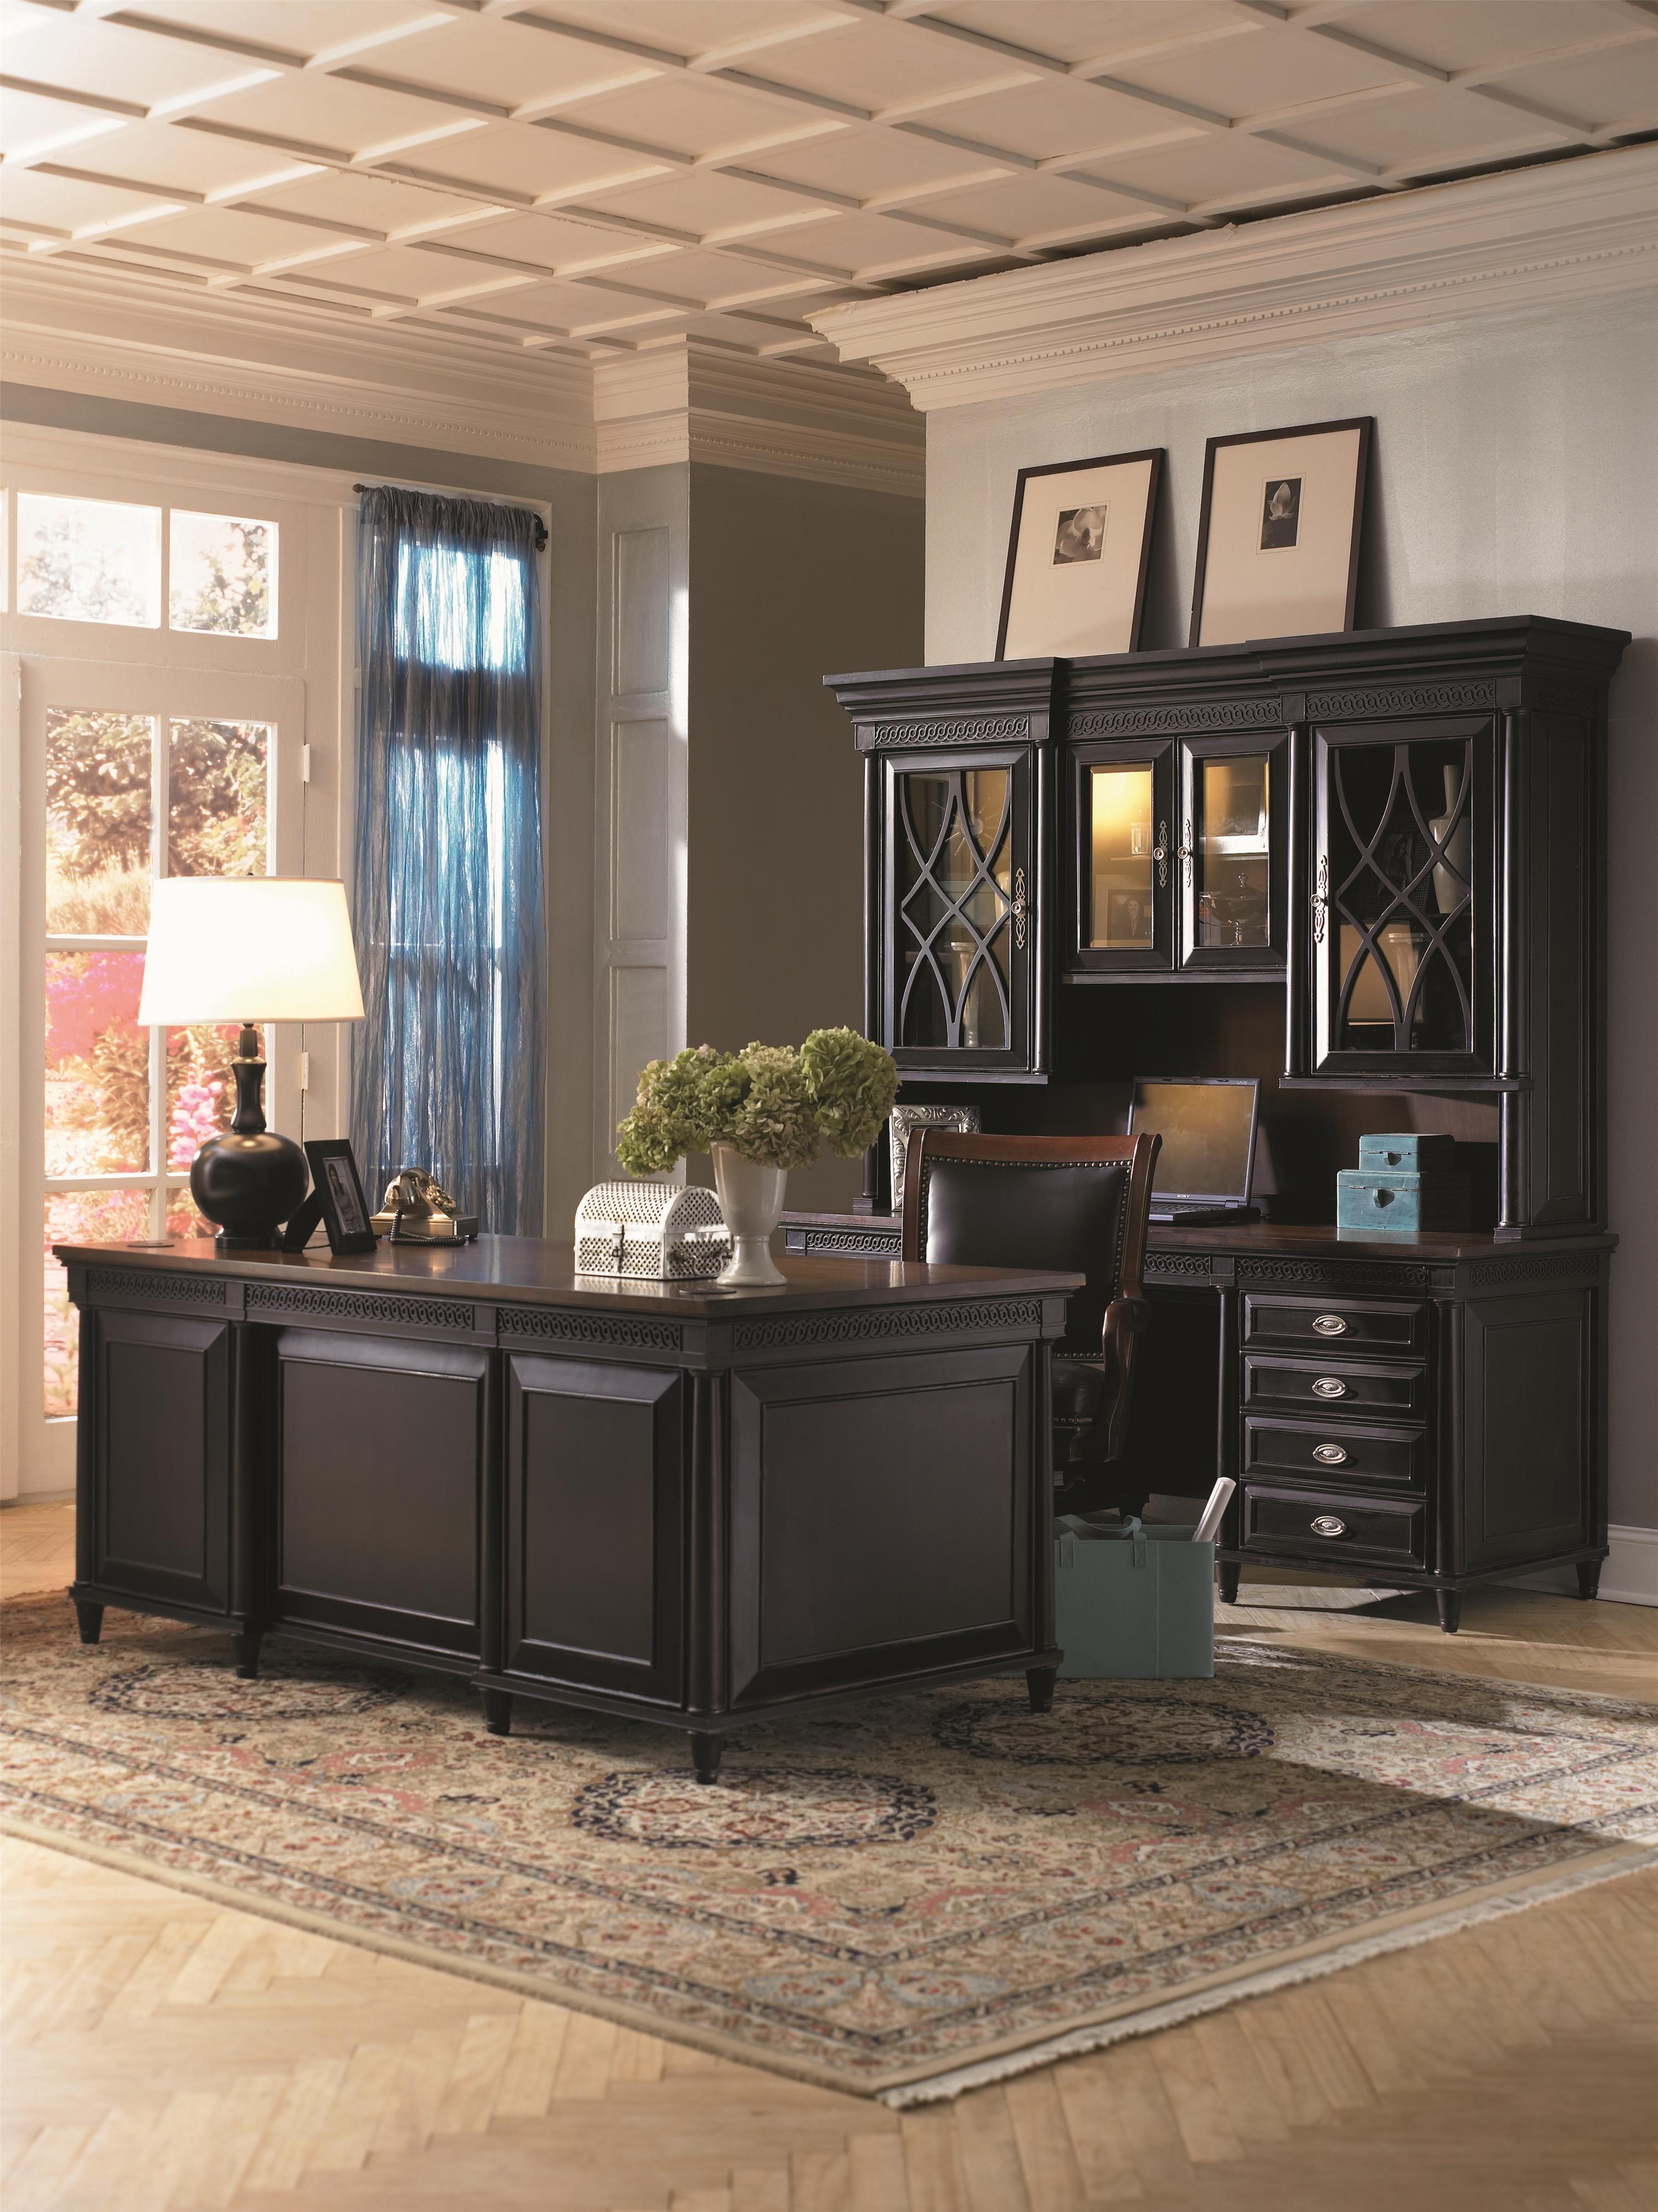 Kadina Craftsman Home Home Office Furniture Cheap Office Furniture Office Interior Design